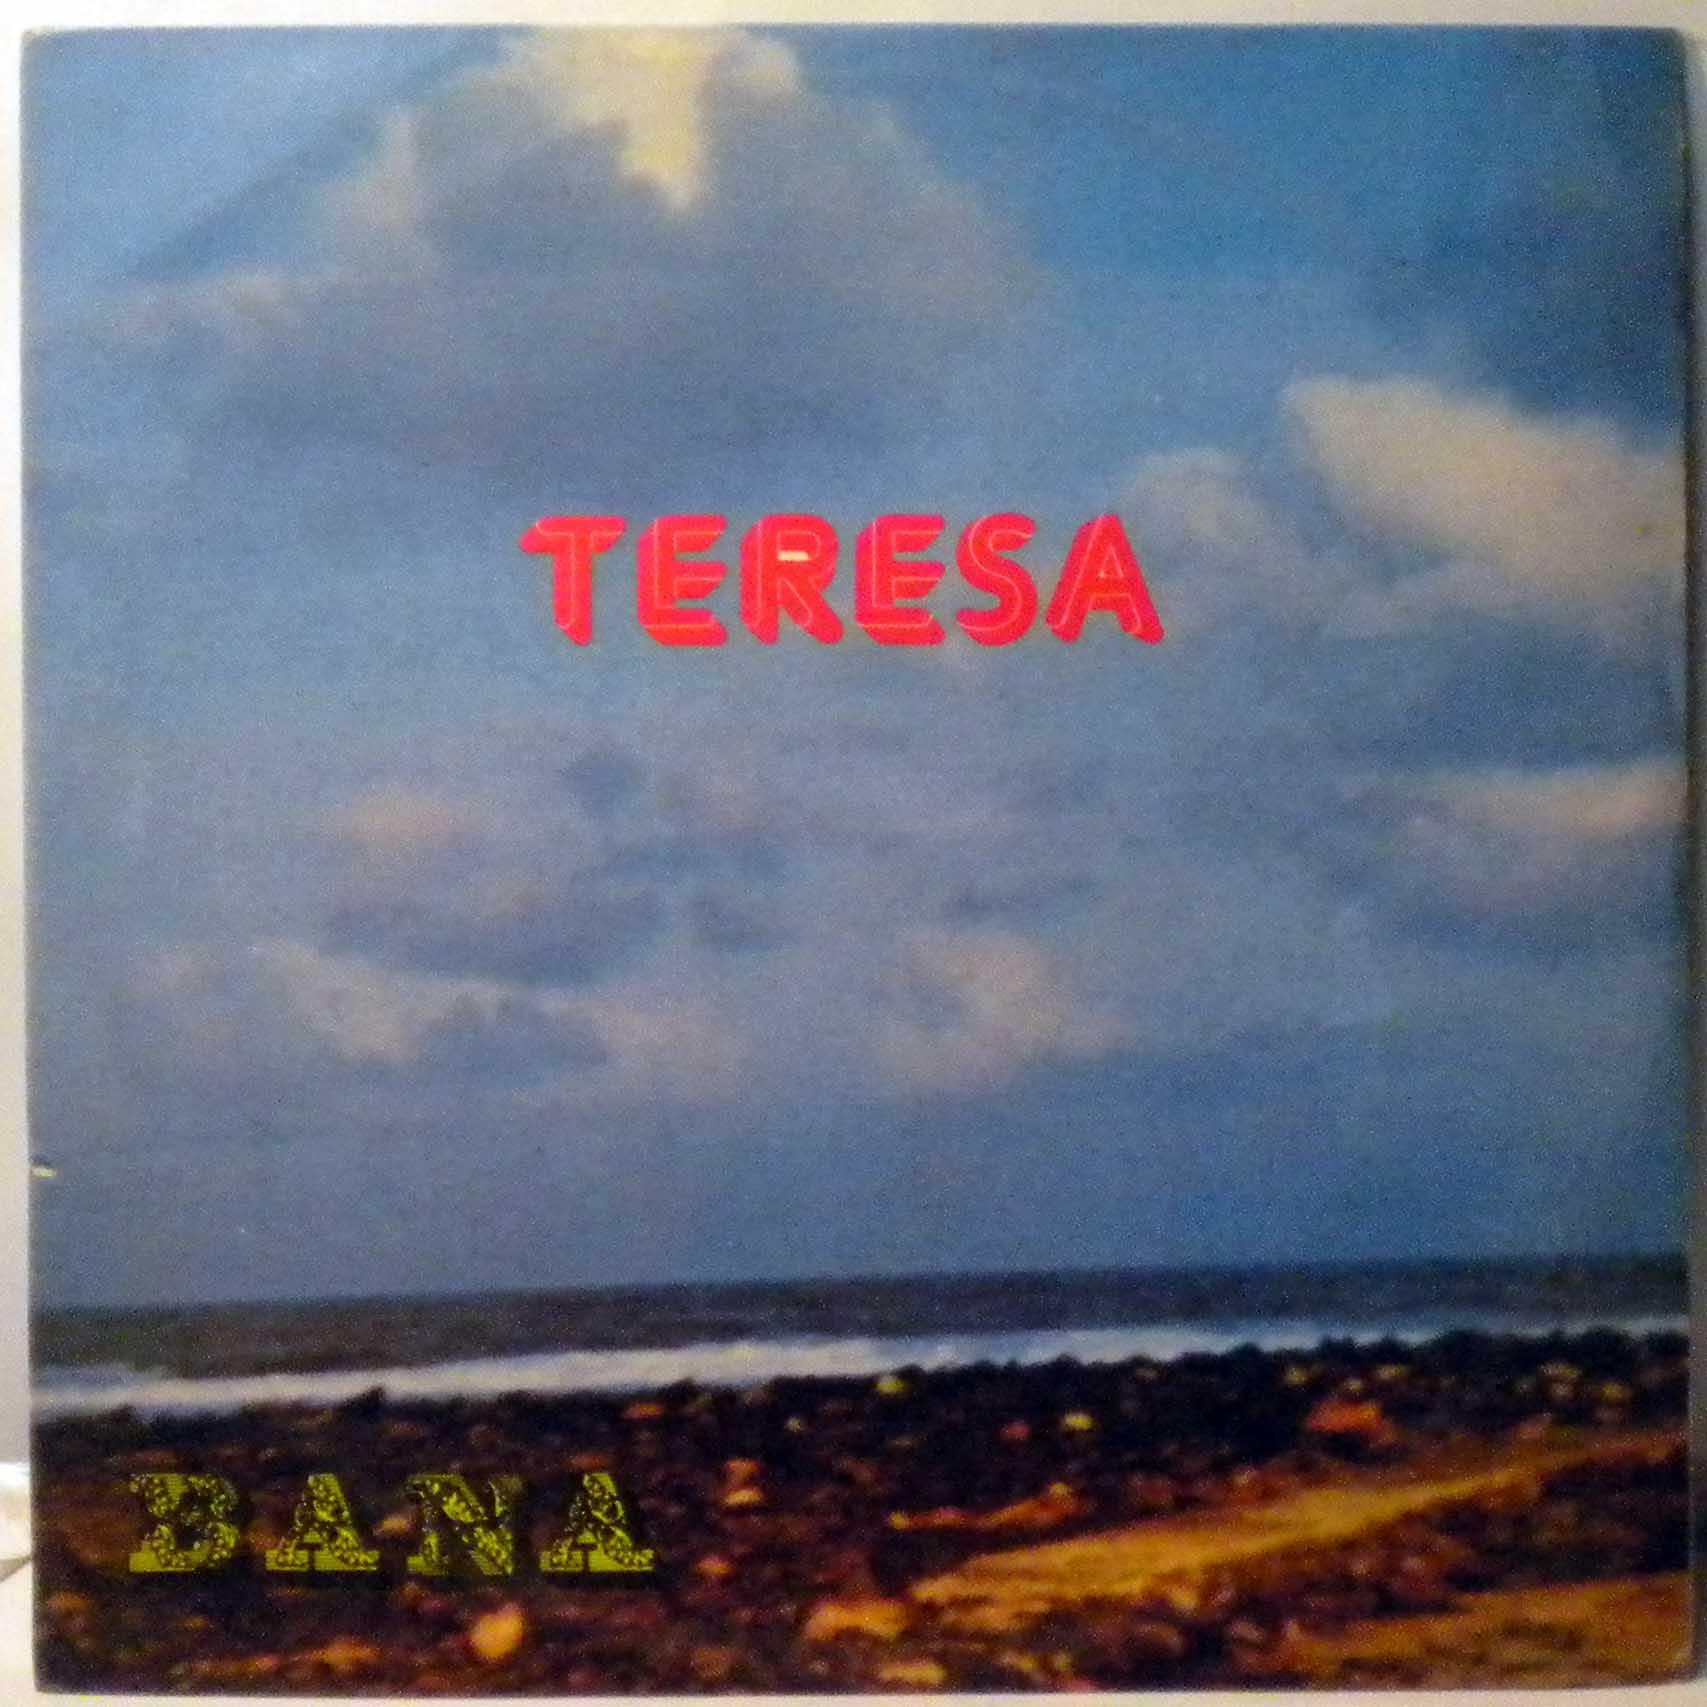 BANA - Teresa - LP